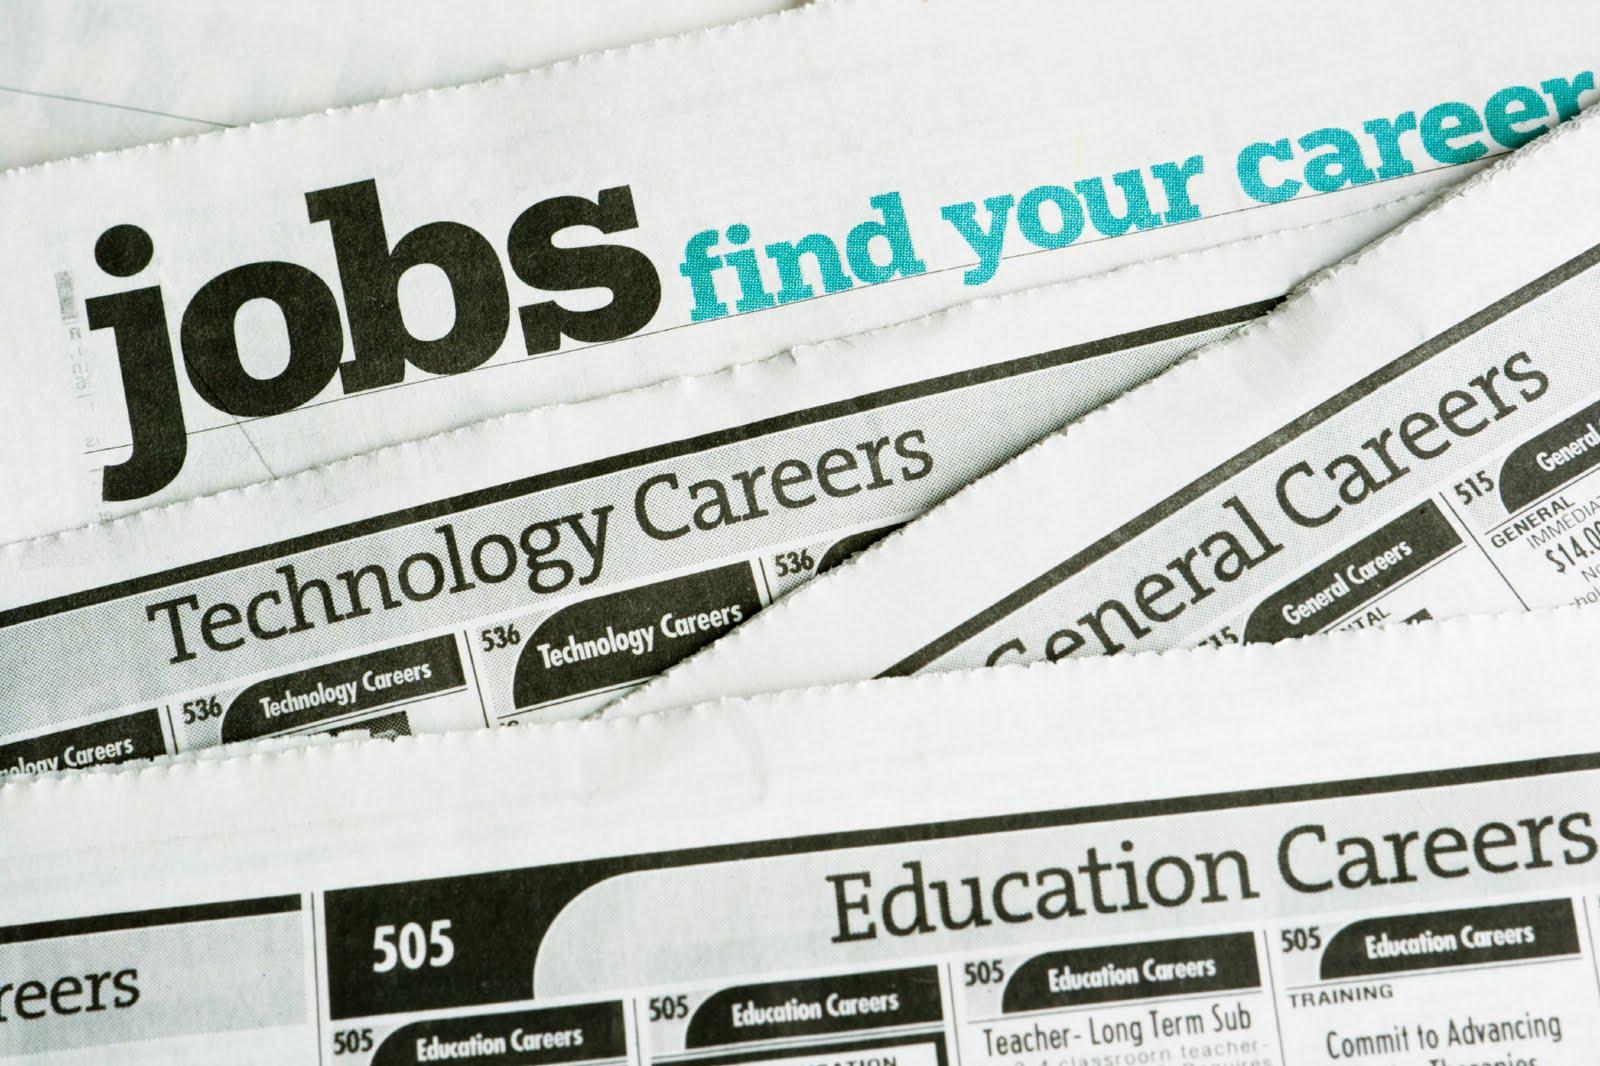 the career path towards becoming an economist